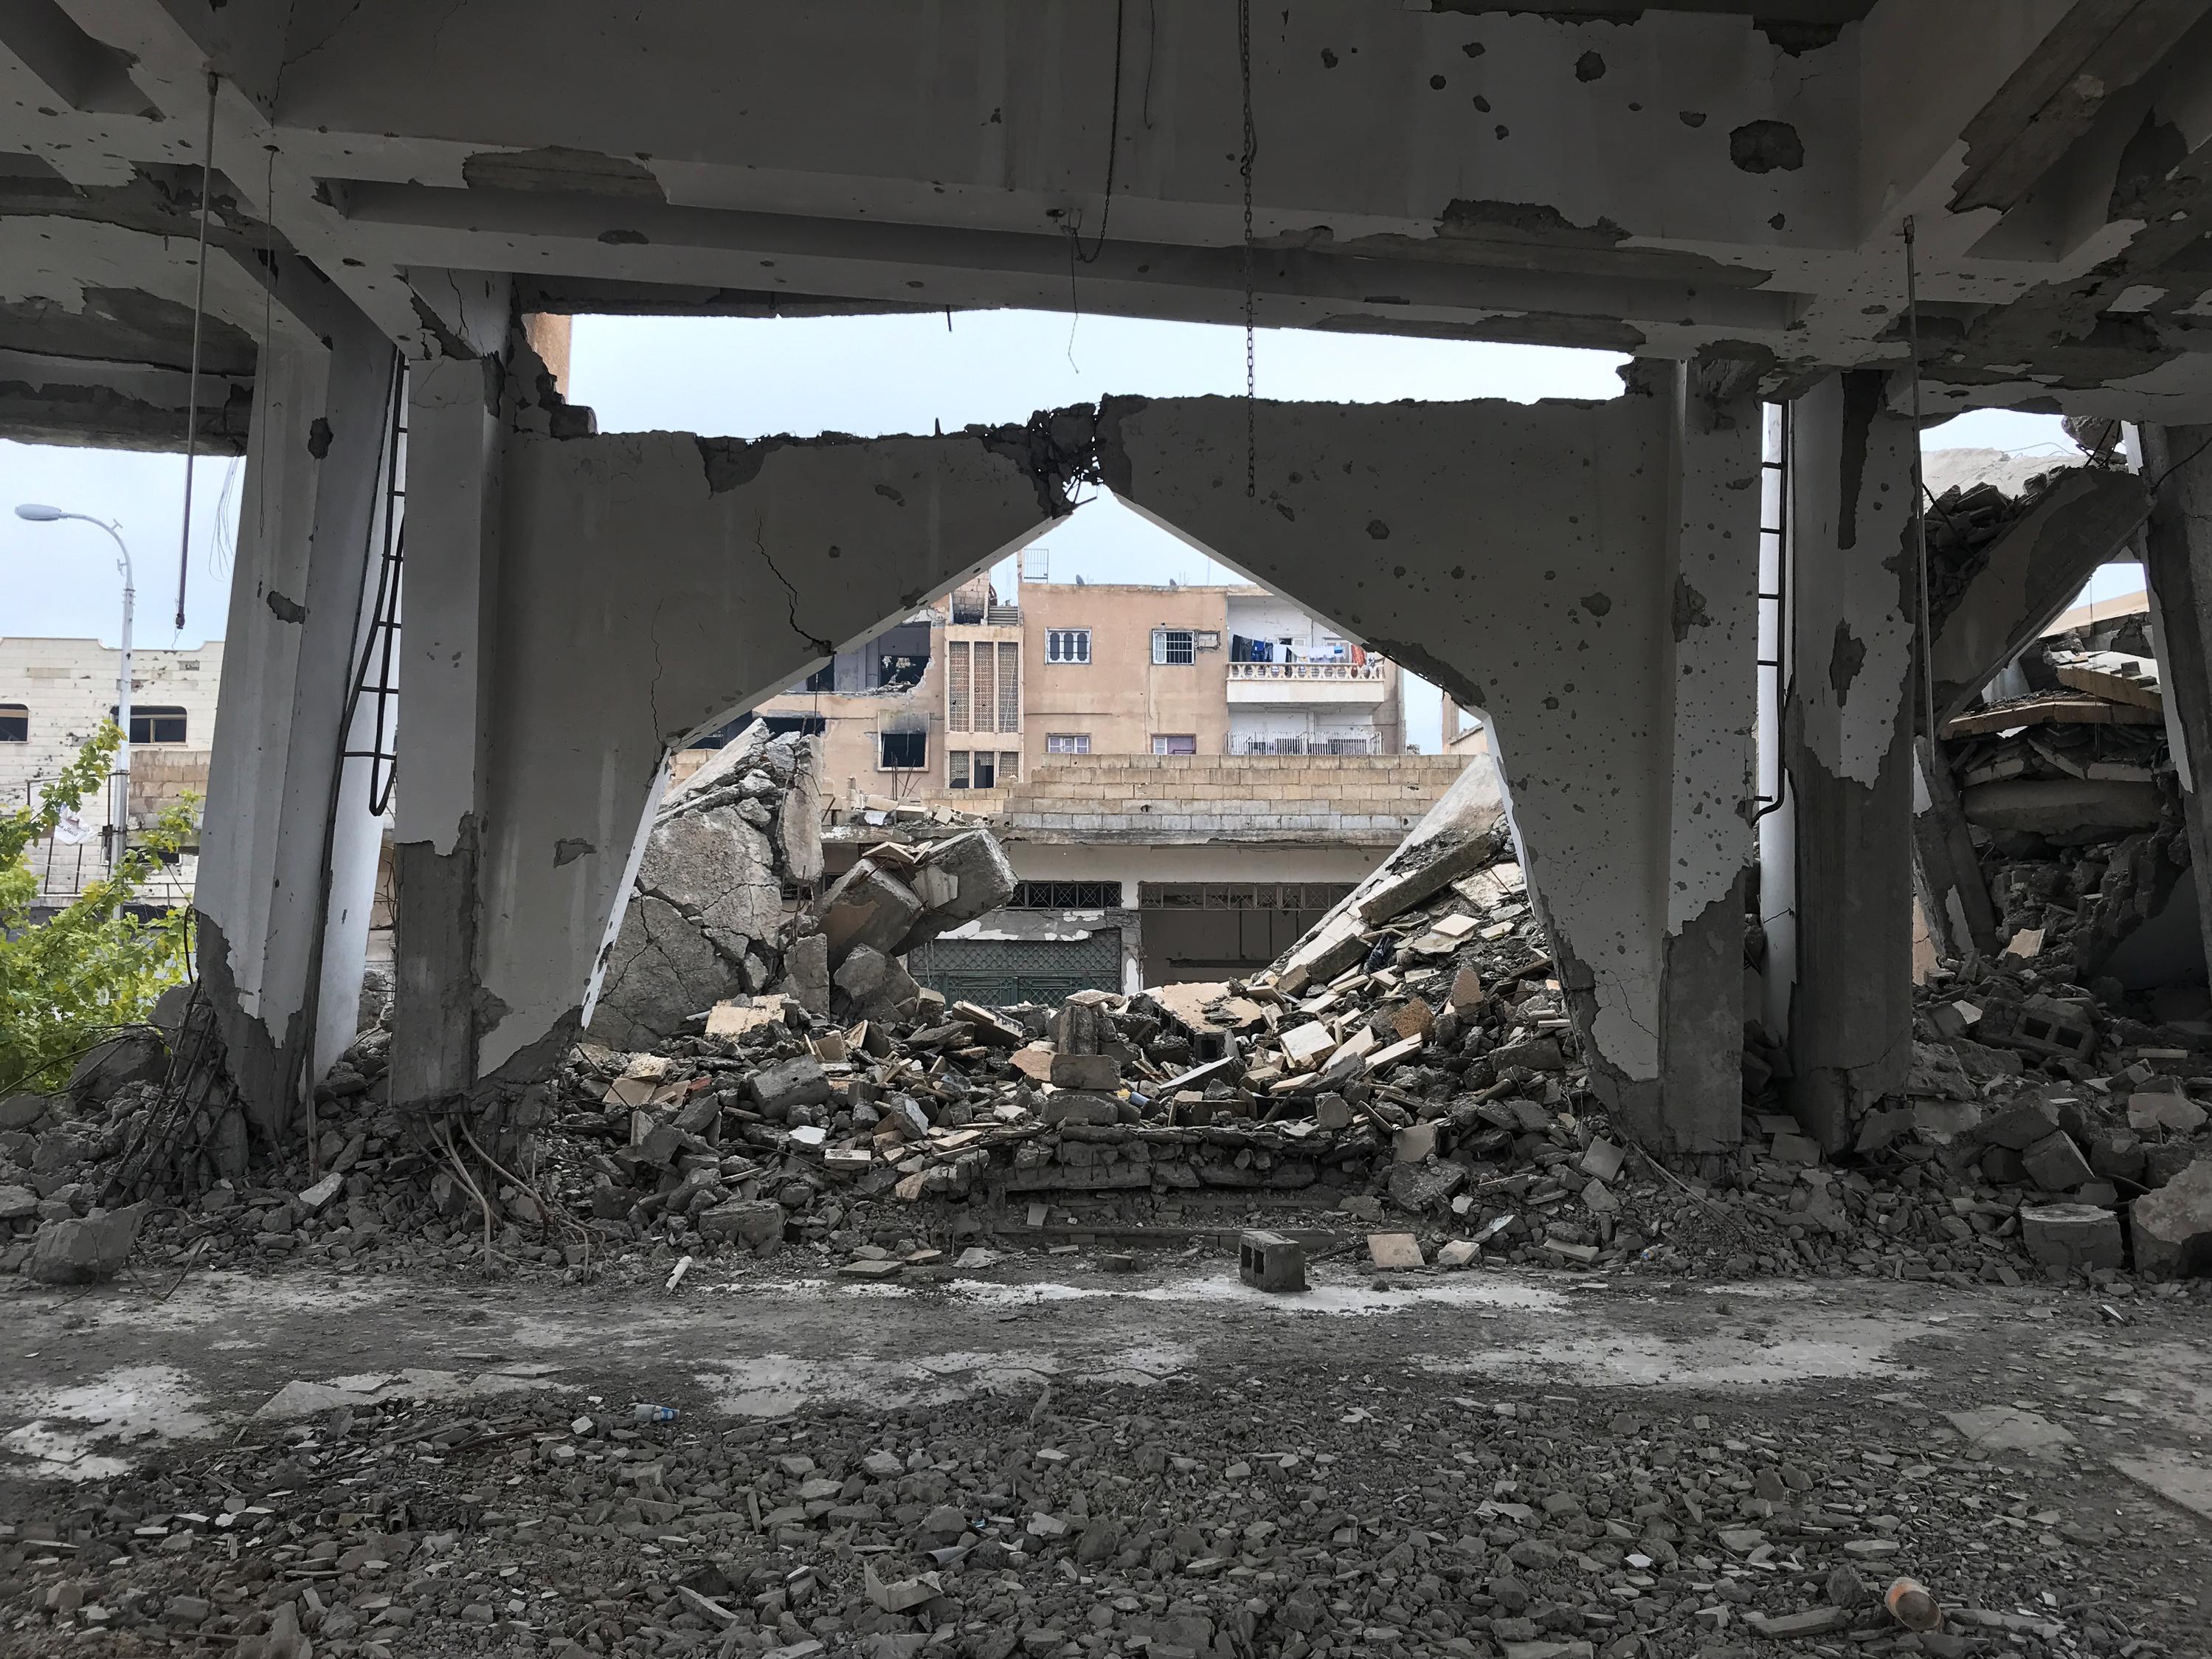 Determined To Seek An Education, Teenagers In Raqqa, Syria, Create Their Own School